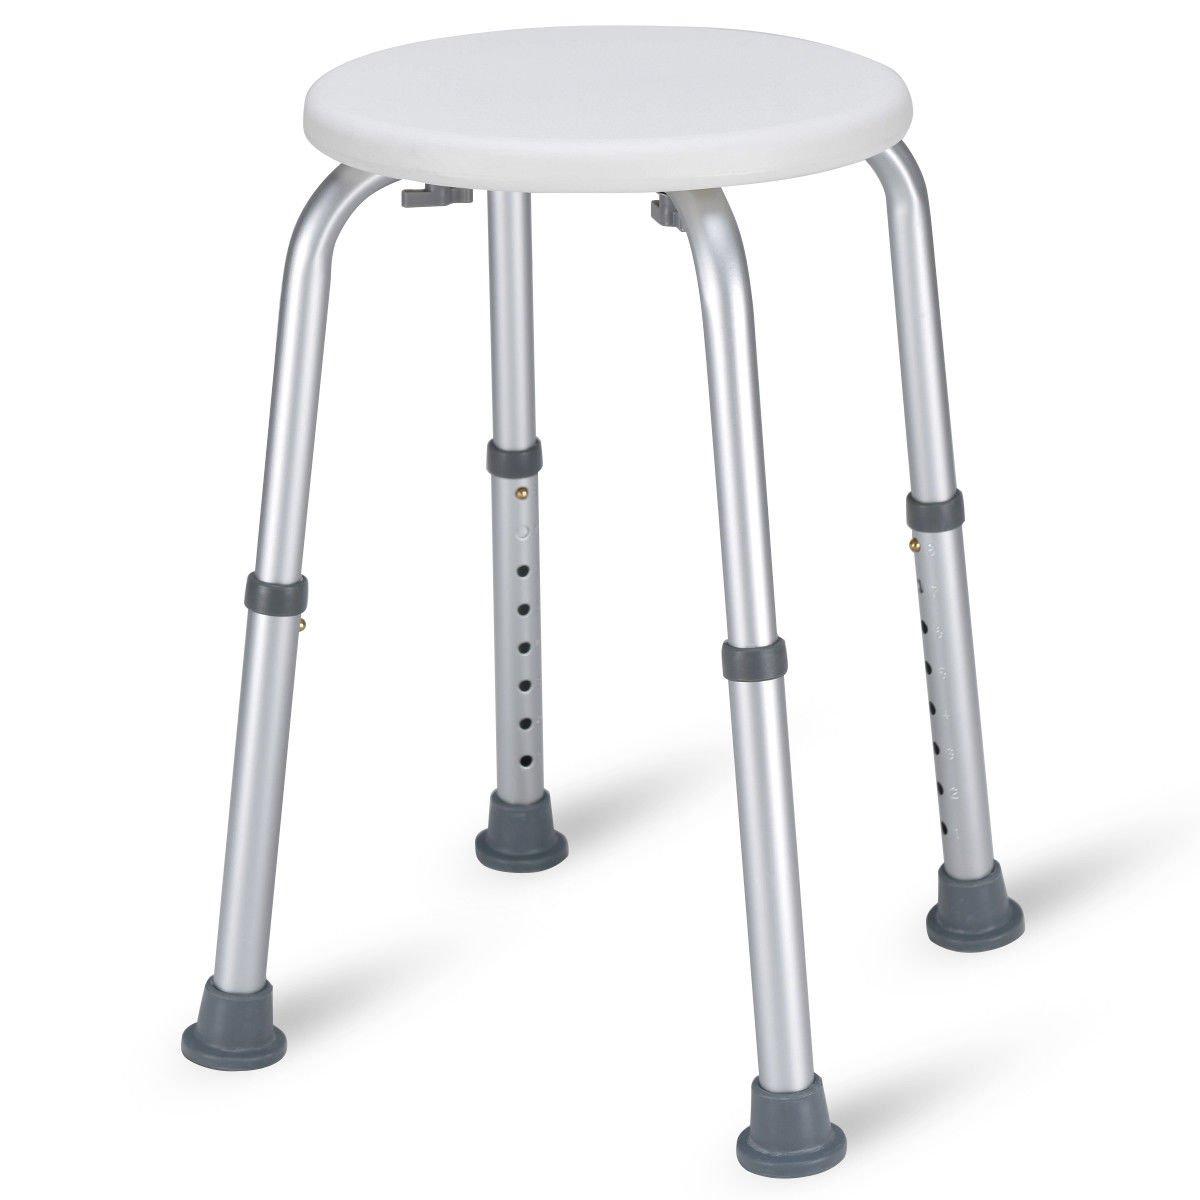 Amazon.com: Caraya 8 Height Adjustable Round Medical Seat Bath Shower Tub  Chair Non-Slip: Health & Personal Care